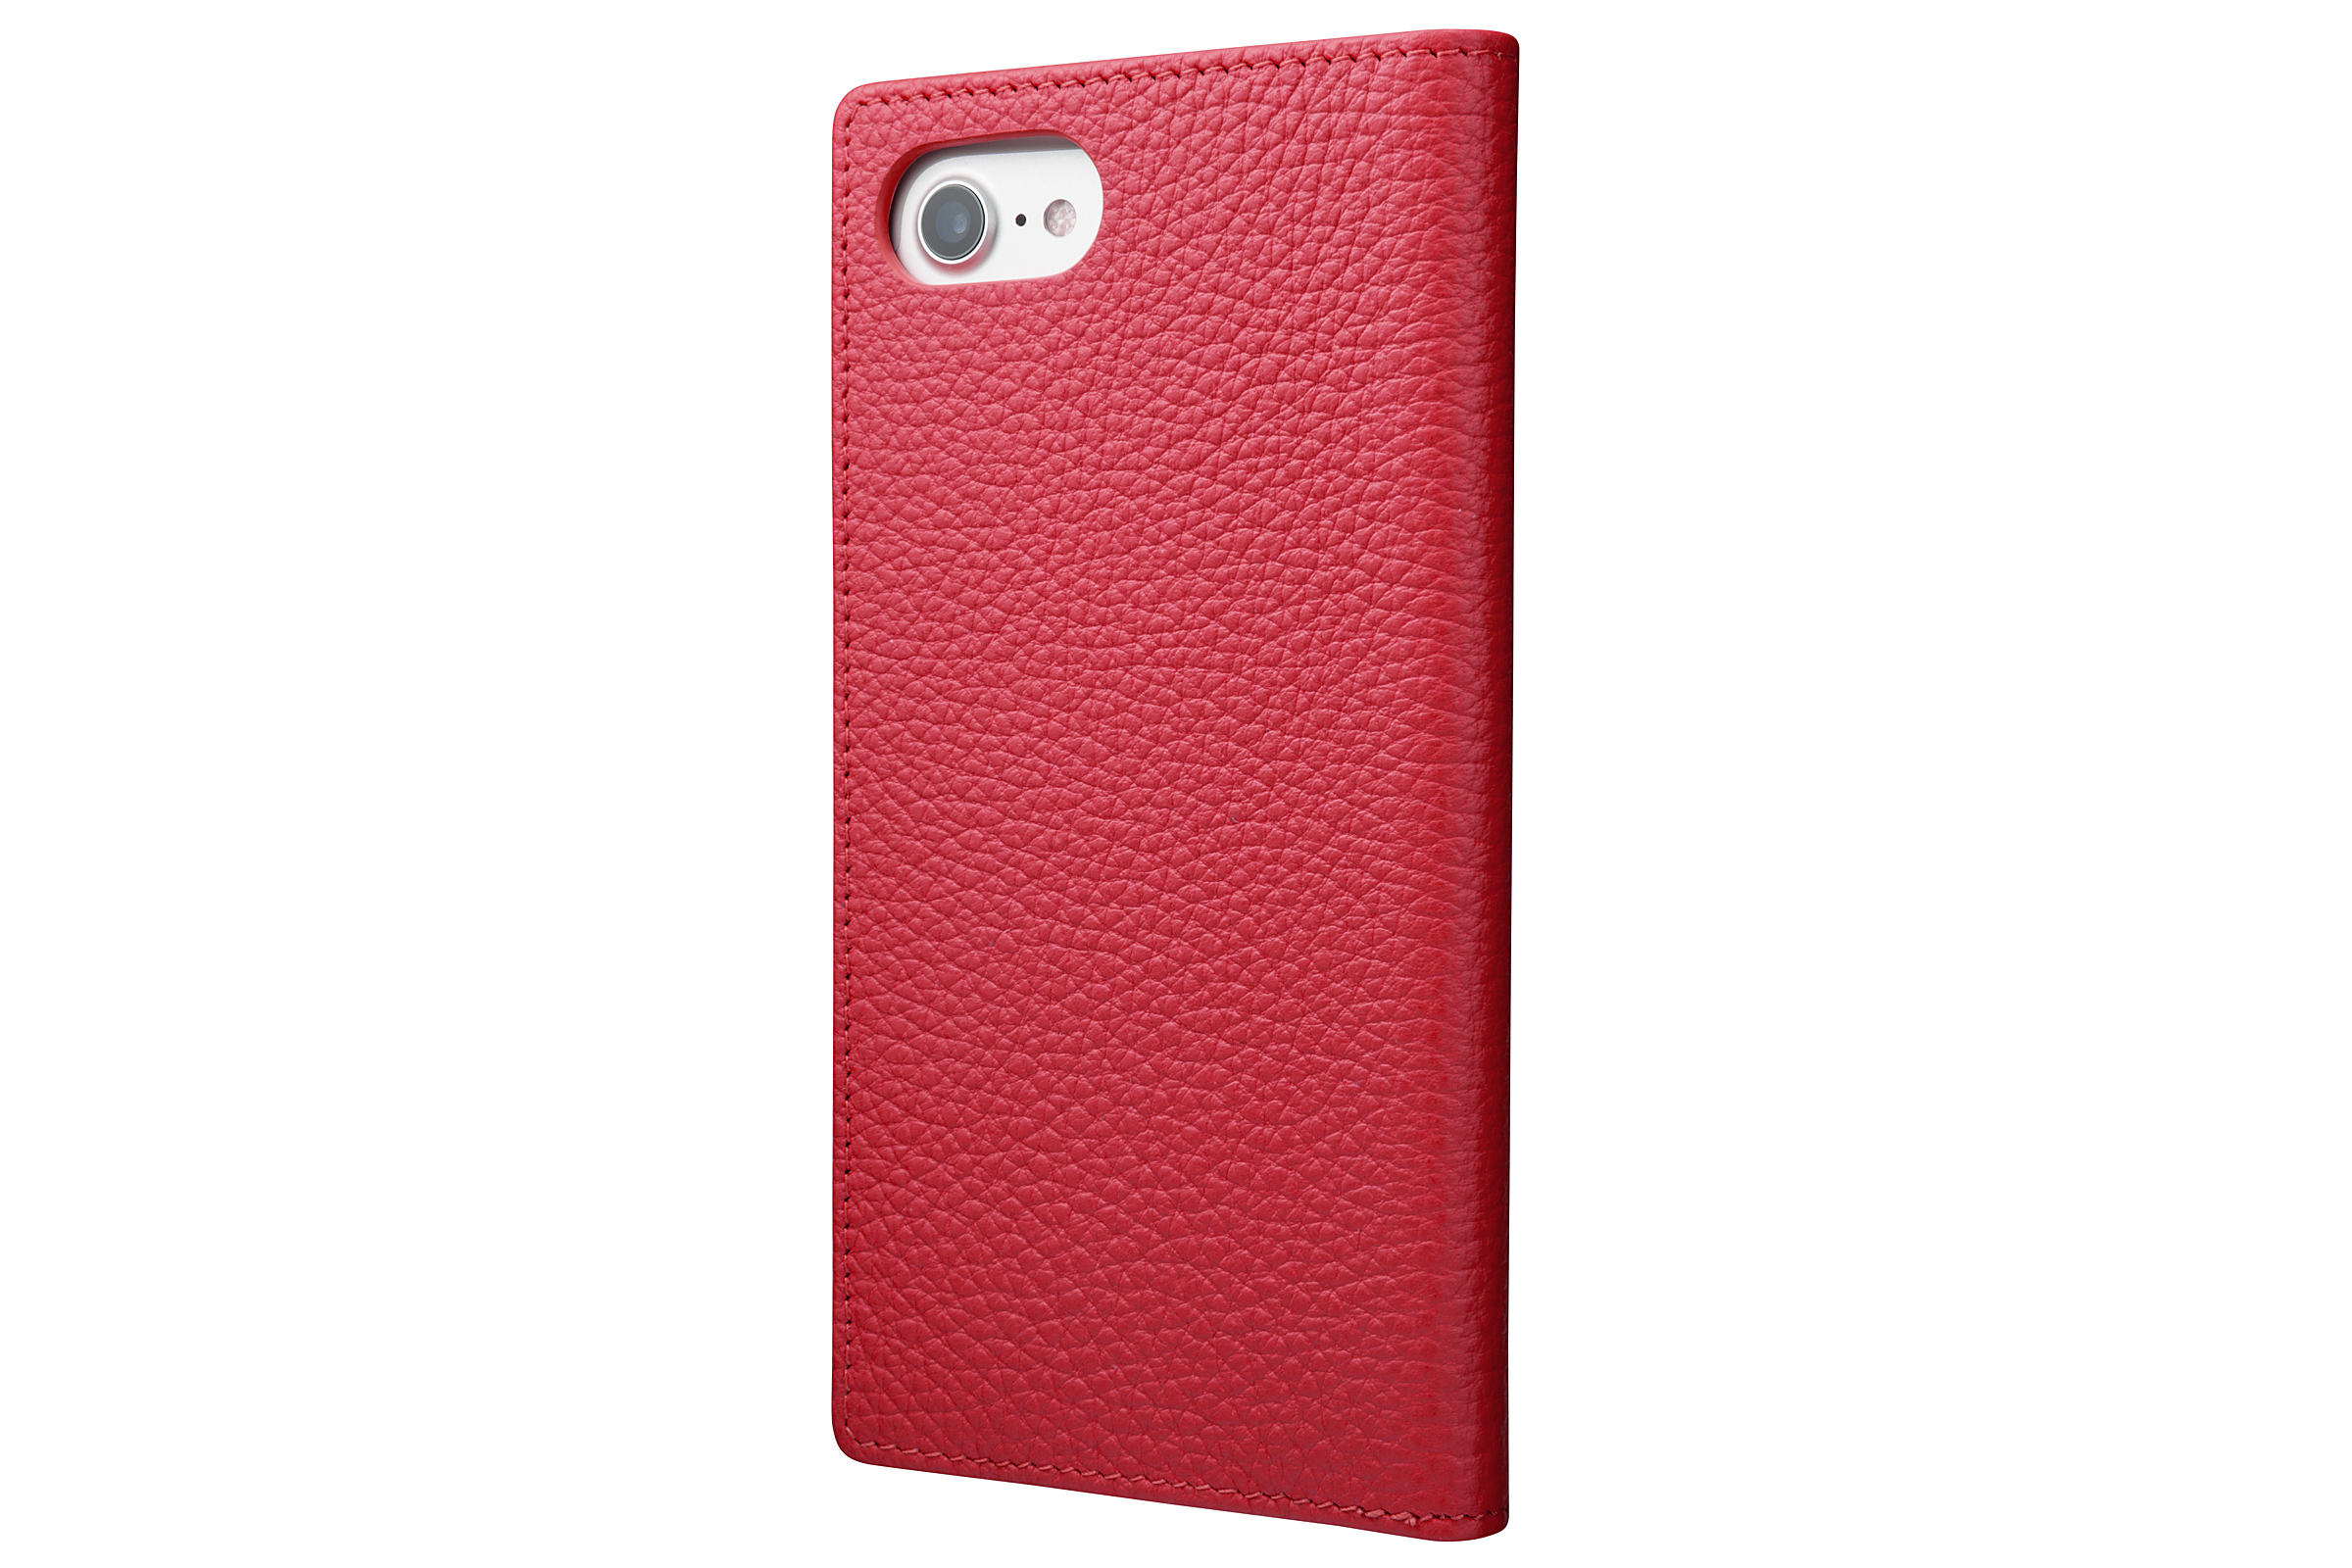 GRAMAS Shrunken-calf Full Leather Case for iPhone 7(Pink) シュランケンカーフ 手帳型フルレザーケース - 画像2